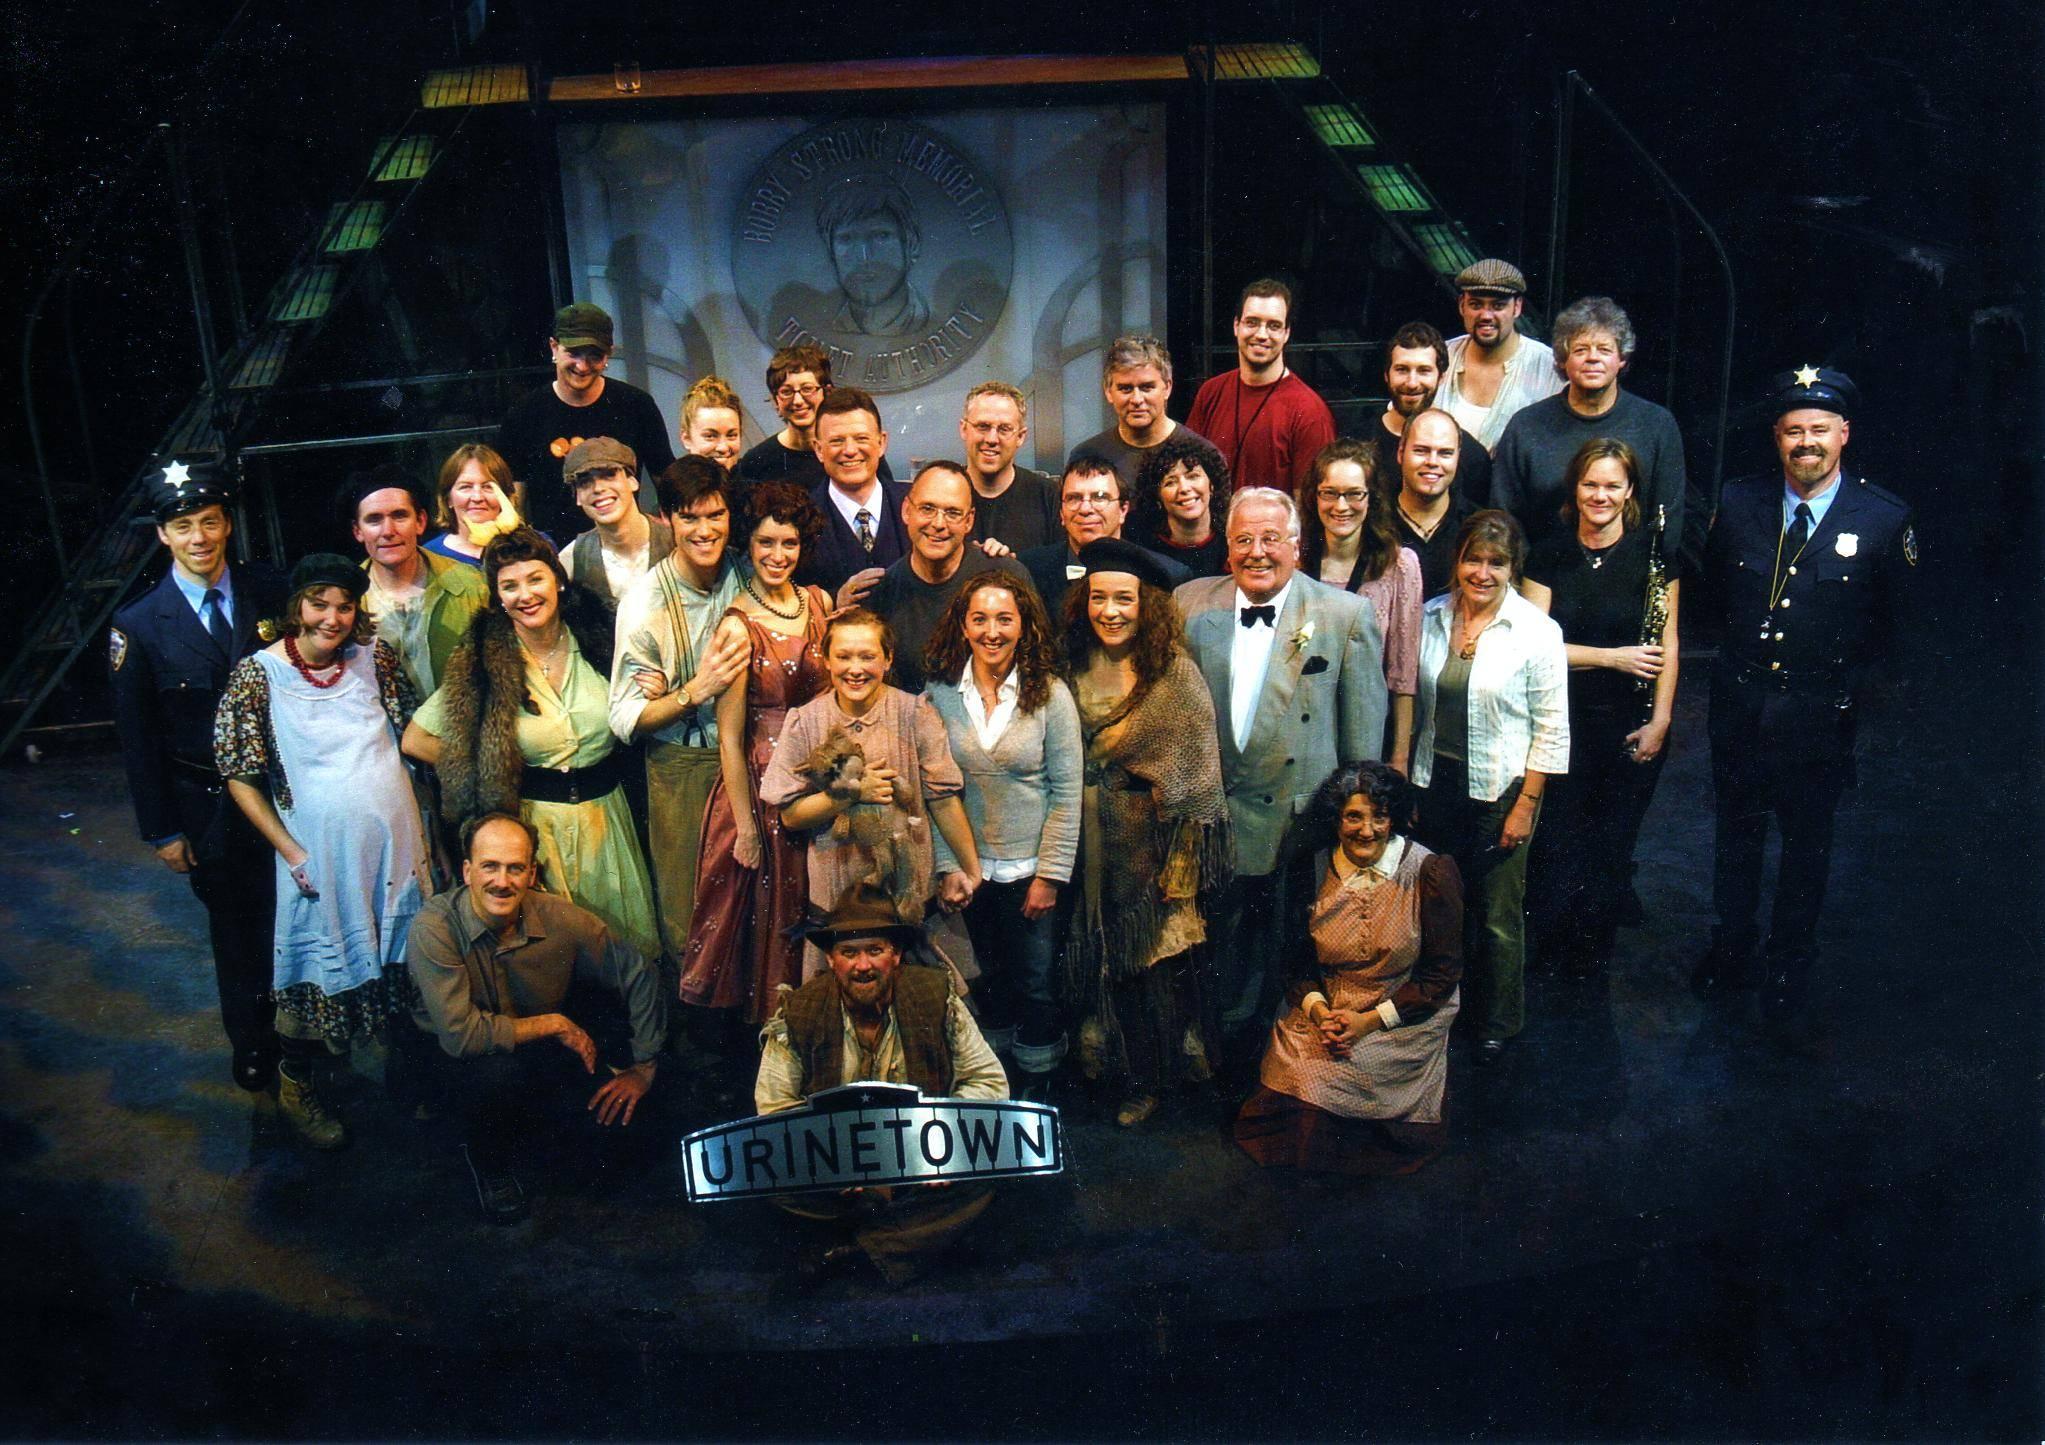 Cast & Crew, Urinetown, Belfry Theatre, Fall 2006